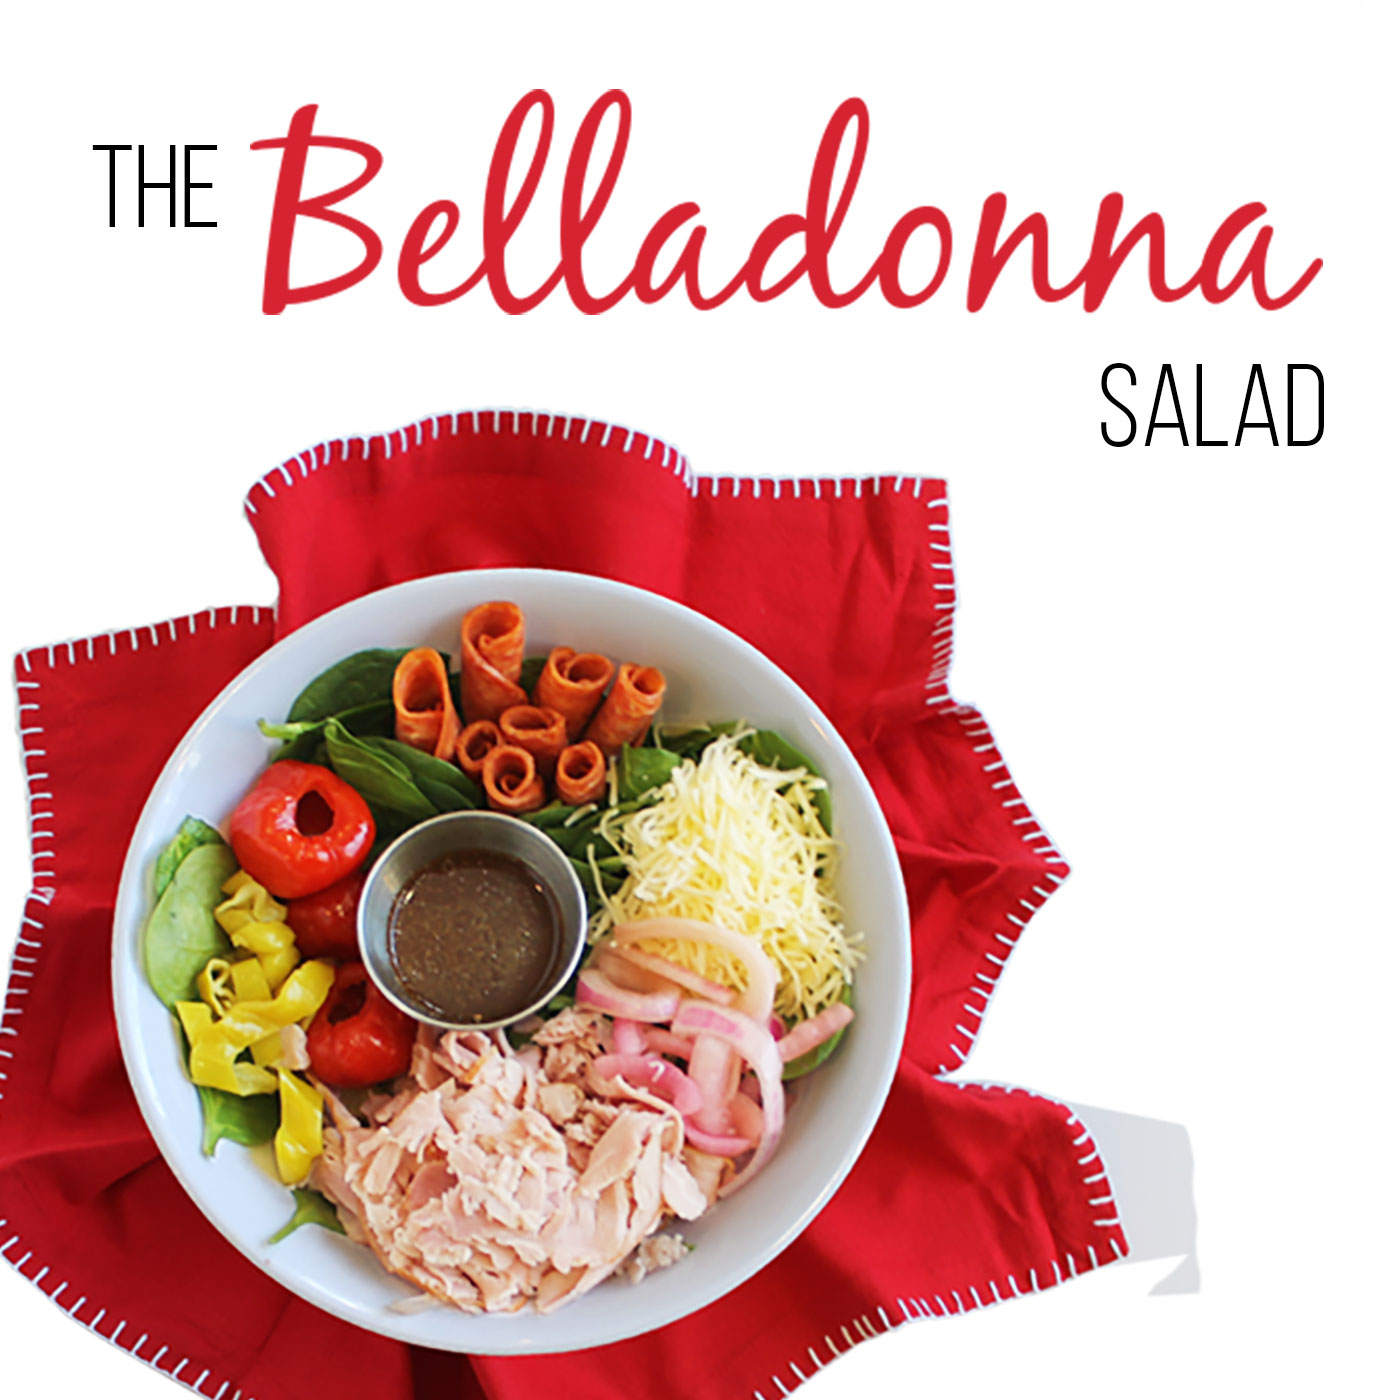 Belladonna Salad